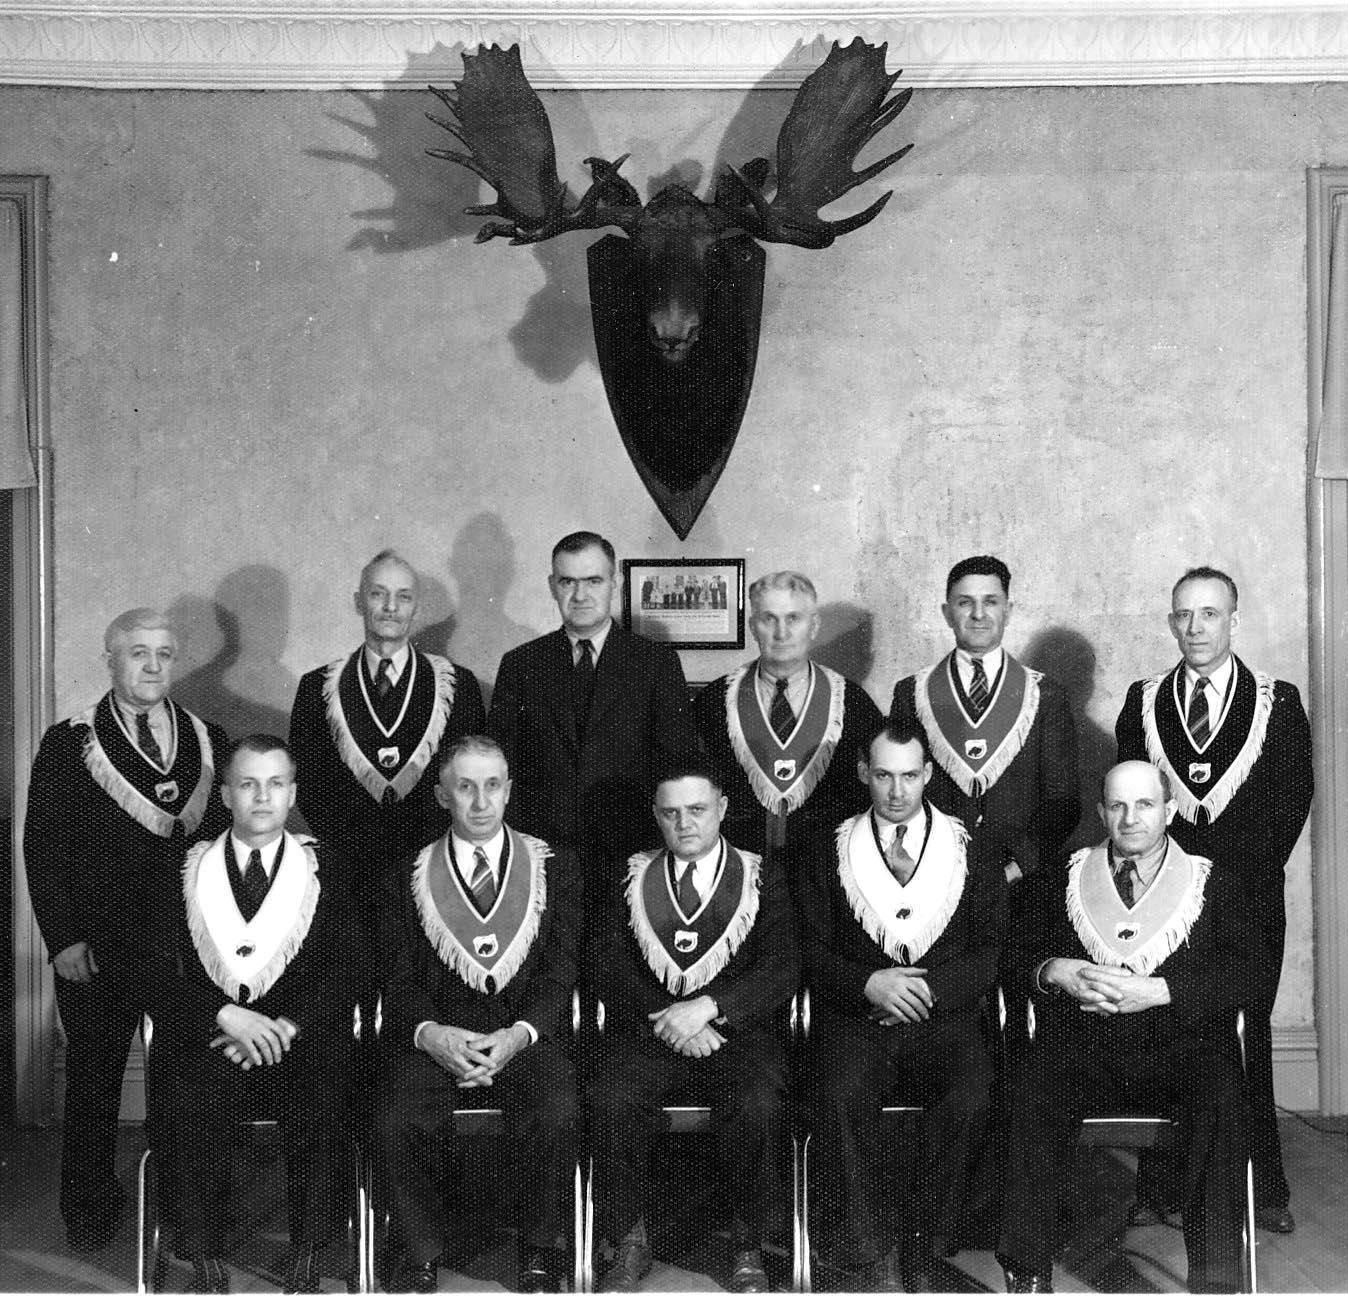 Loyal Order of Moose - Wikipedia